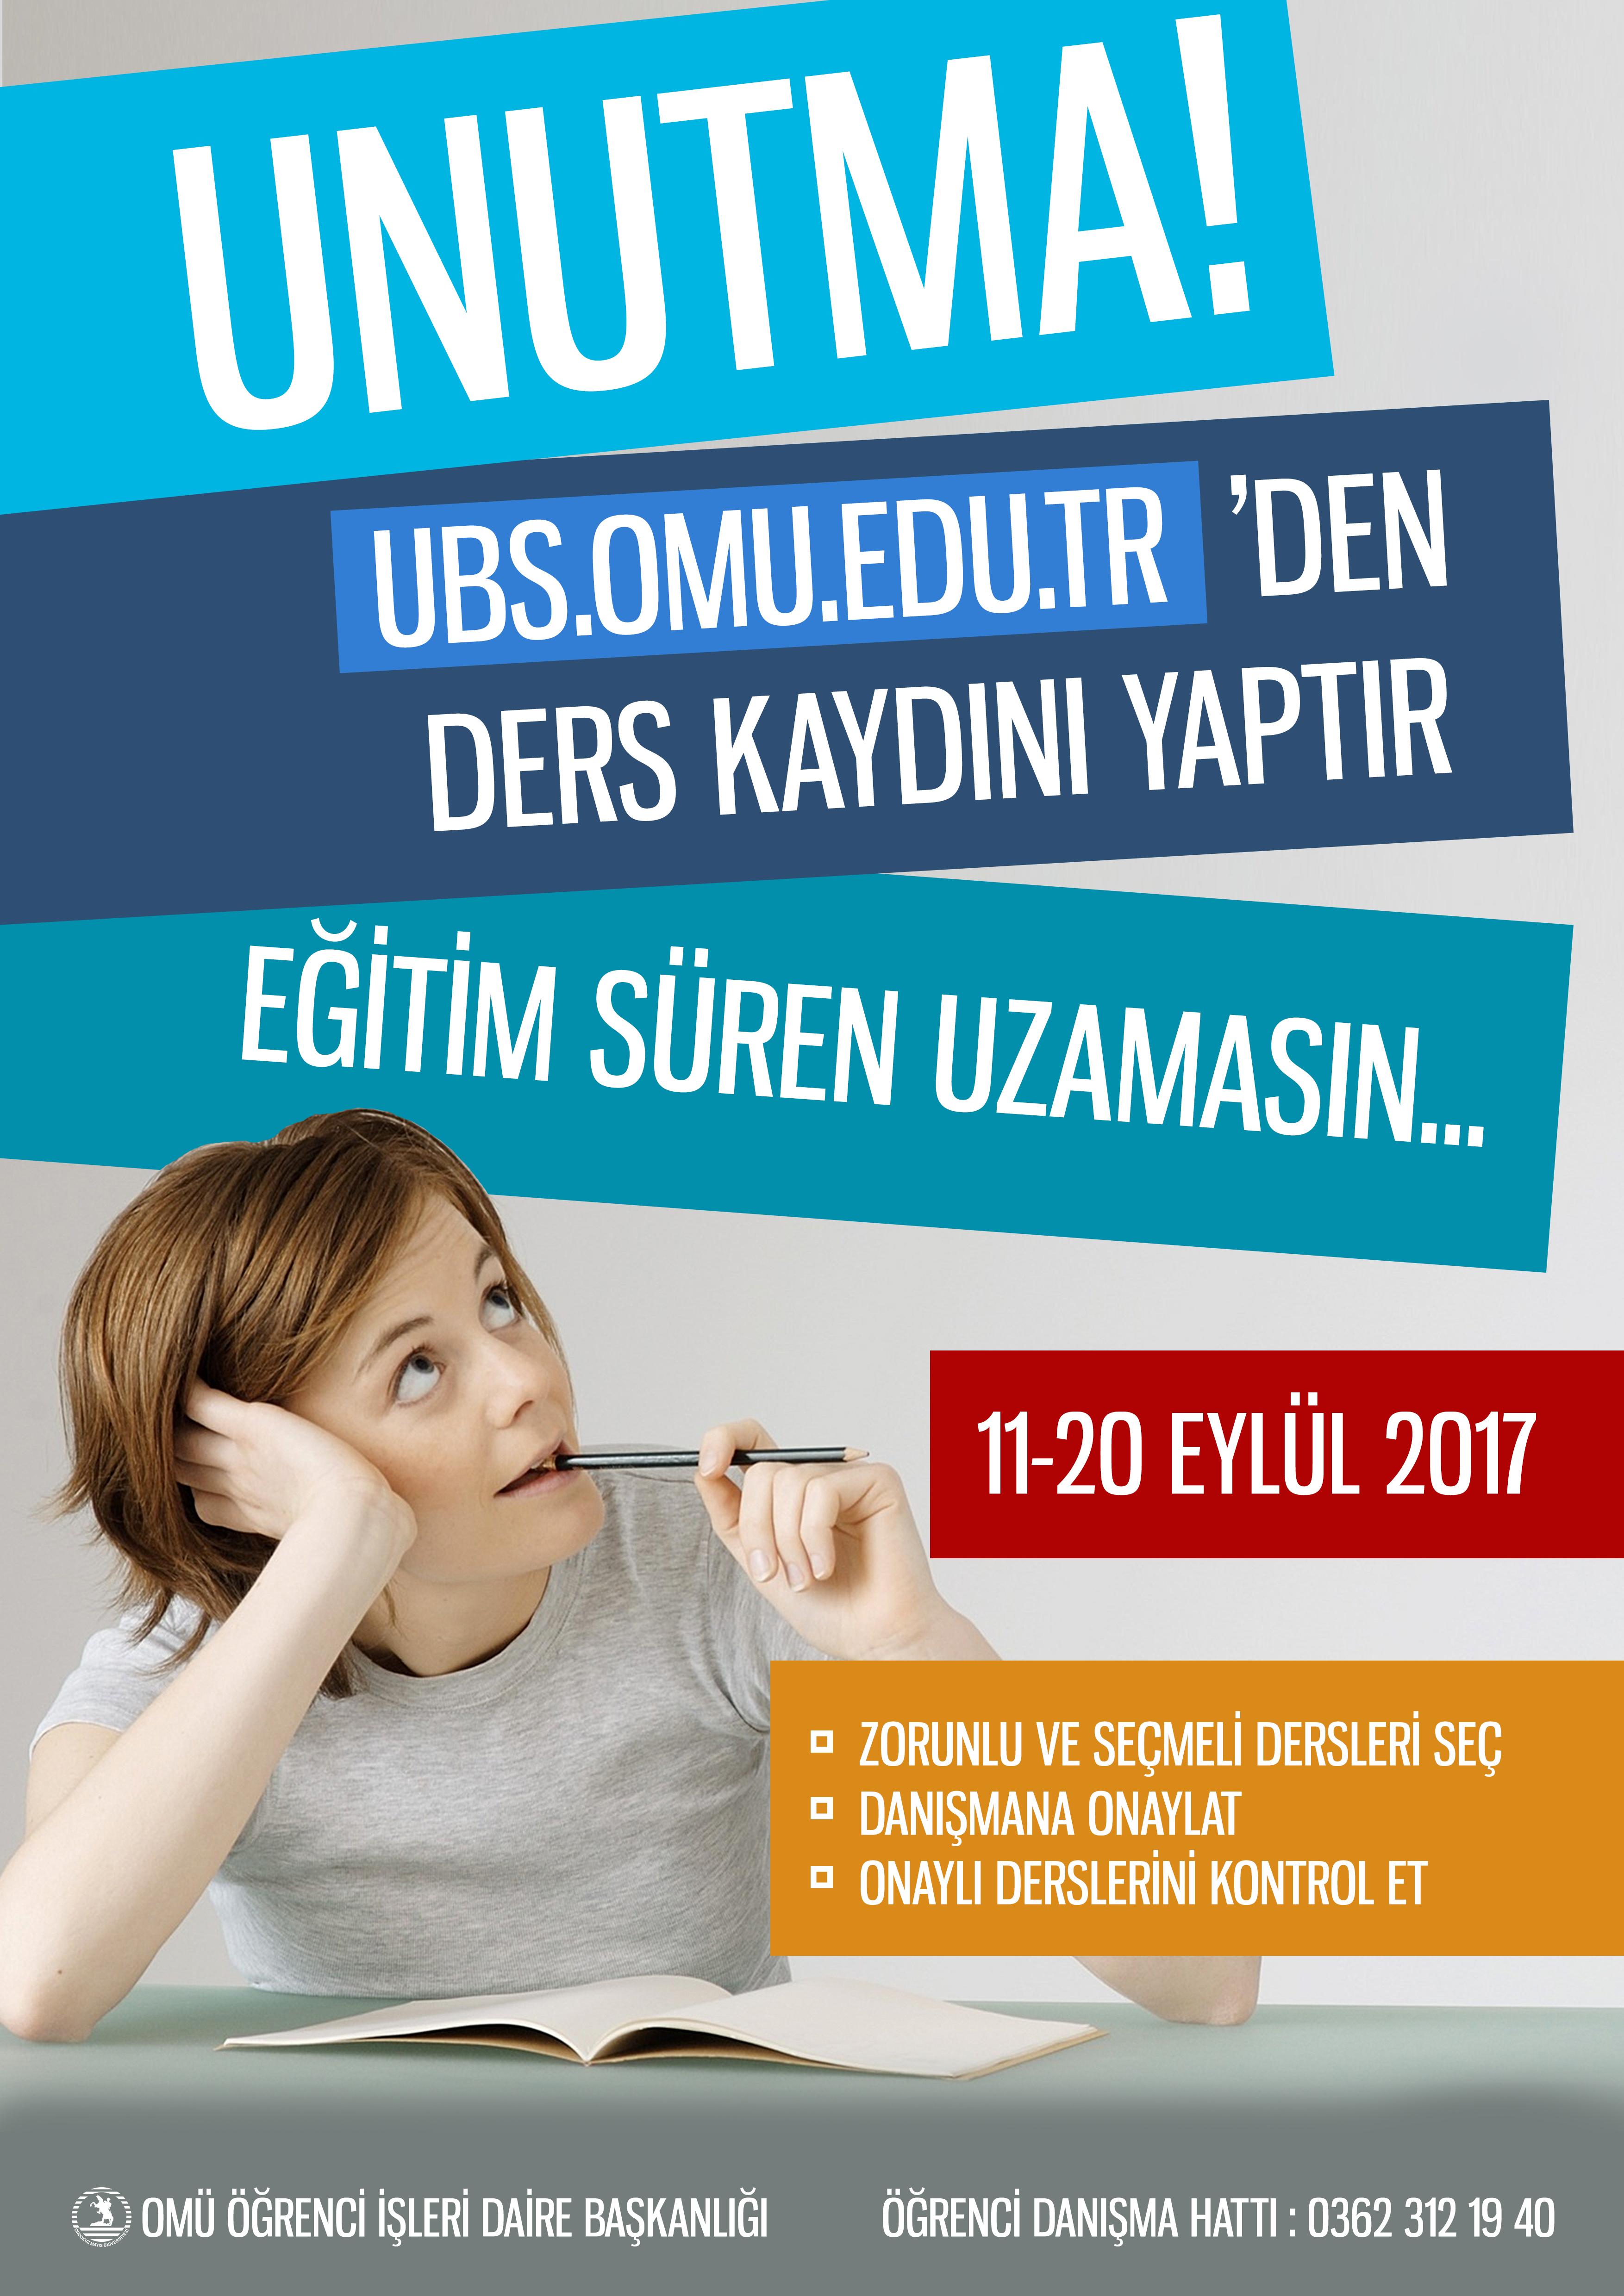 http://www.omu.edu.tr/sites/default/files/files/guz_yariyili_ogrenci_ders_kayit_takvimi/oidb-derskayit-poster.jpg